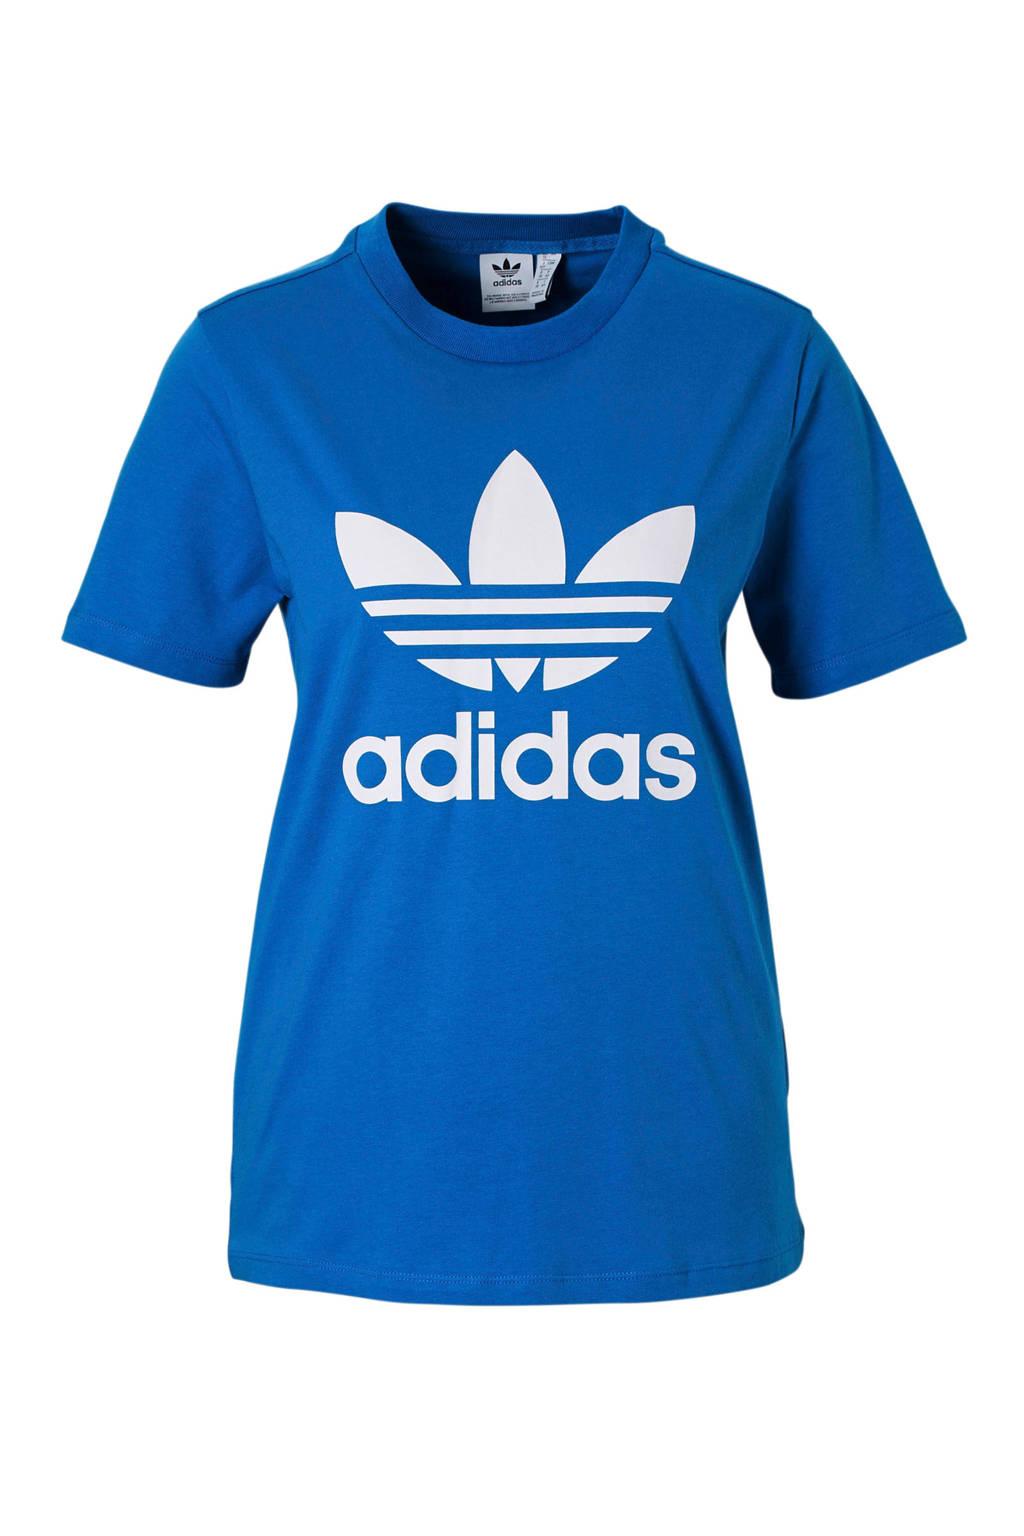 a929e720c7d adidas originals T-shirt blauw, Blauw, Dames